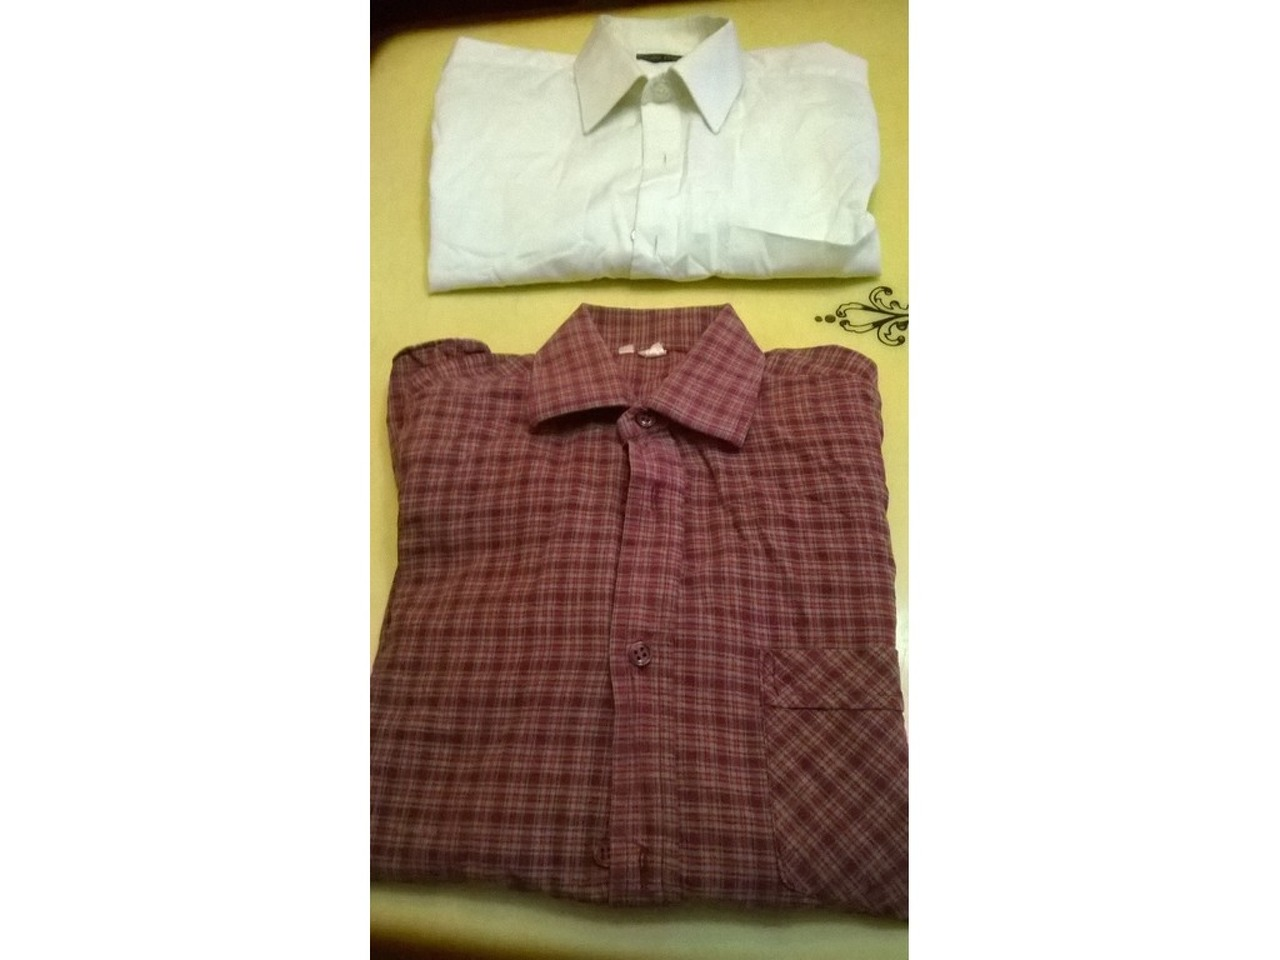 Camisas Diversas (2ª mão) WestPoint, Emidio Tucci, Posse, etc - 4/4